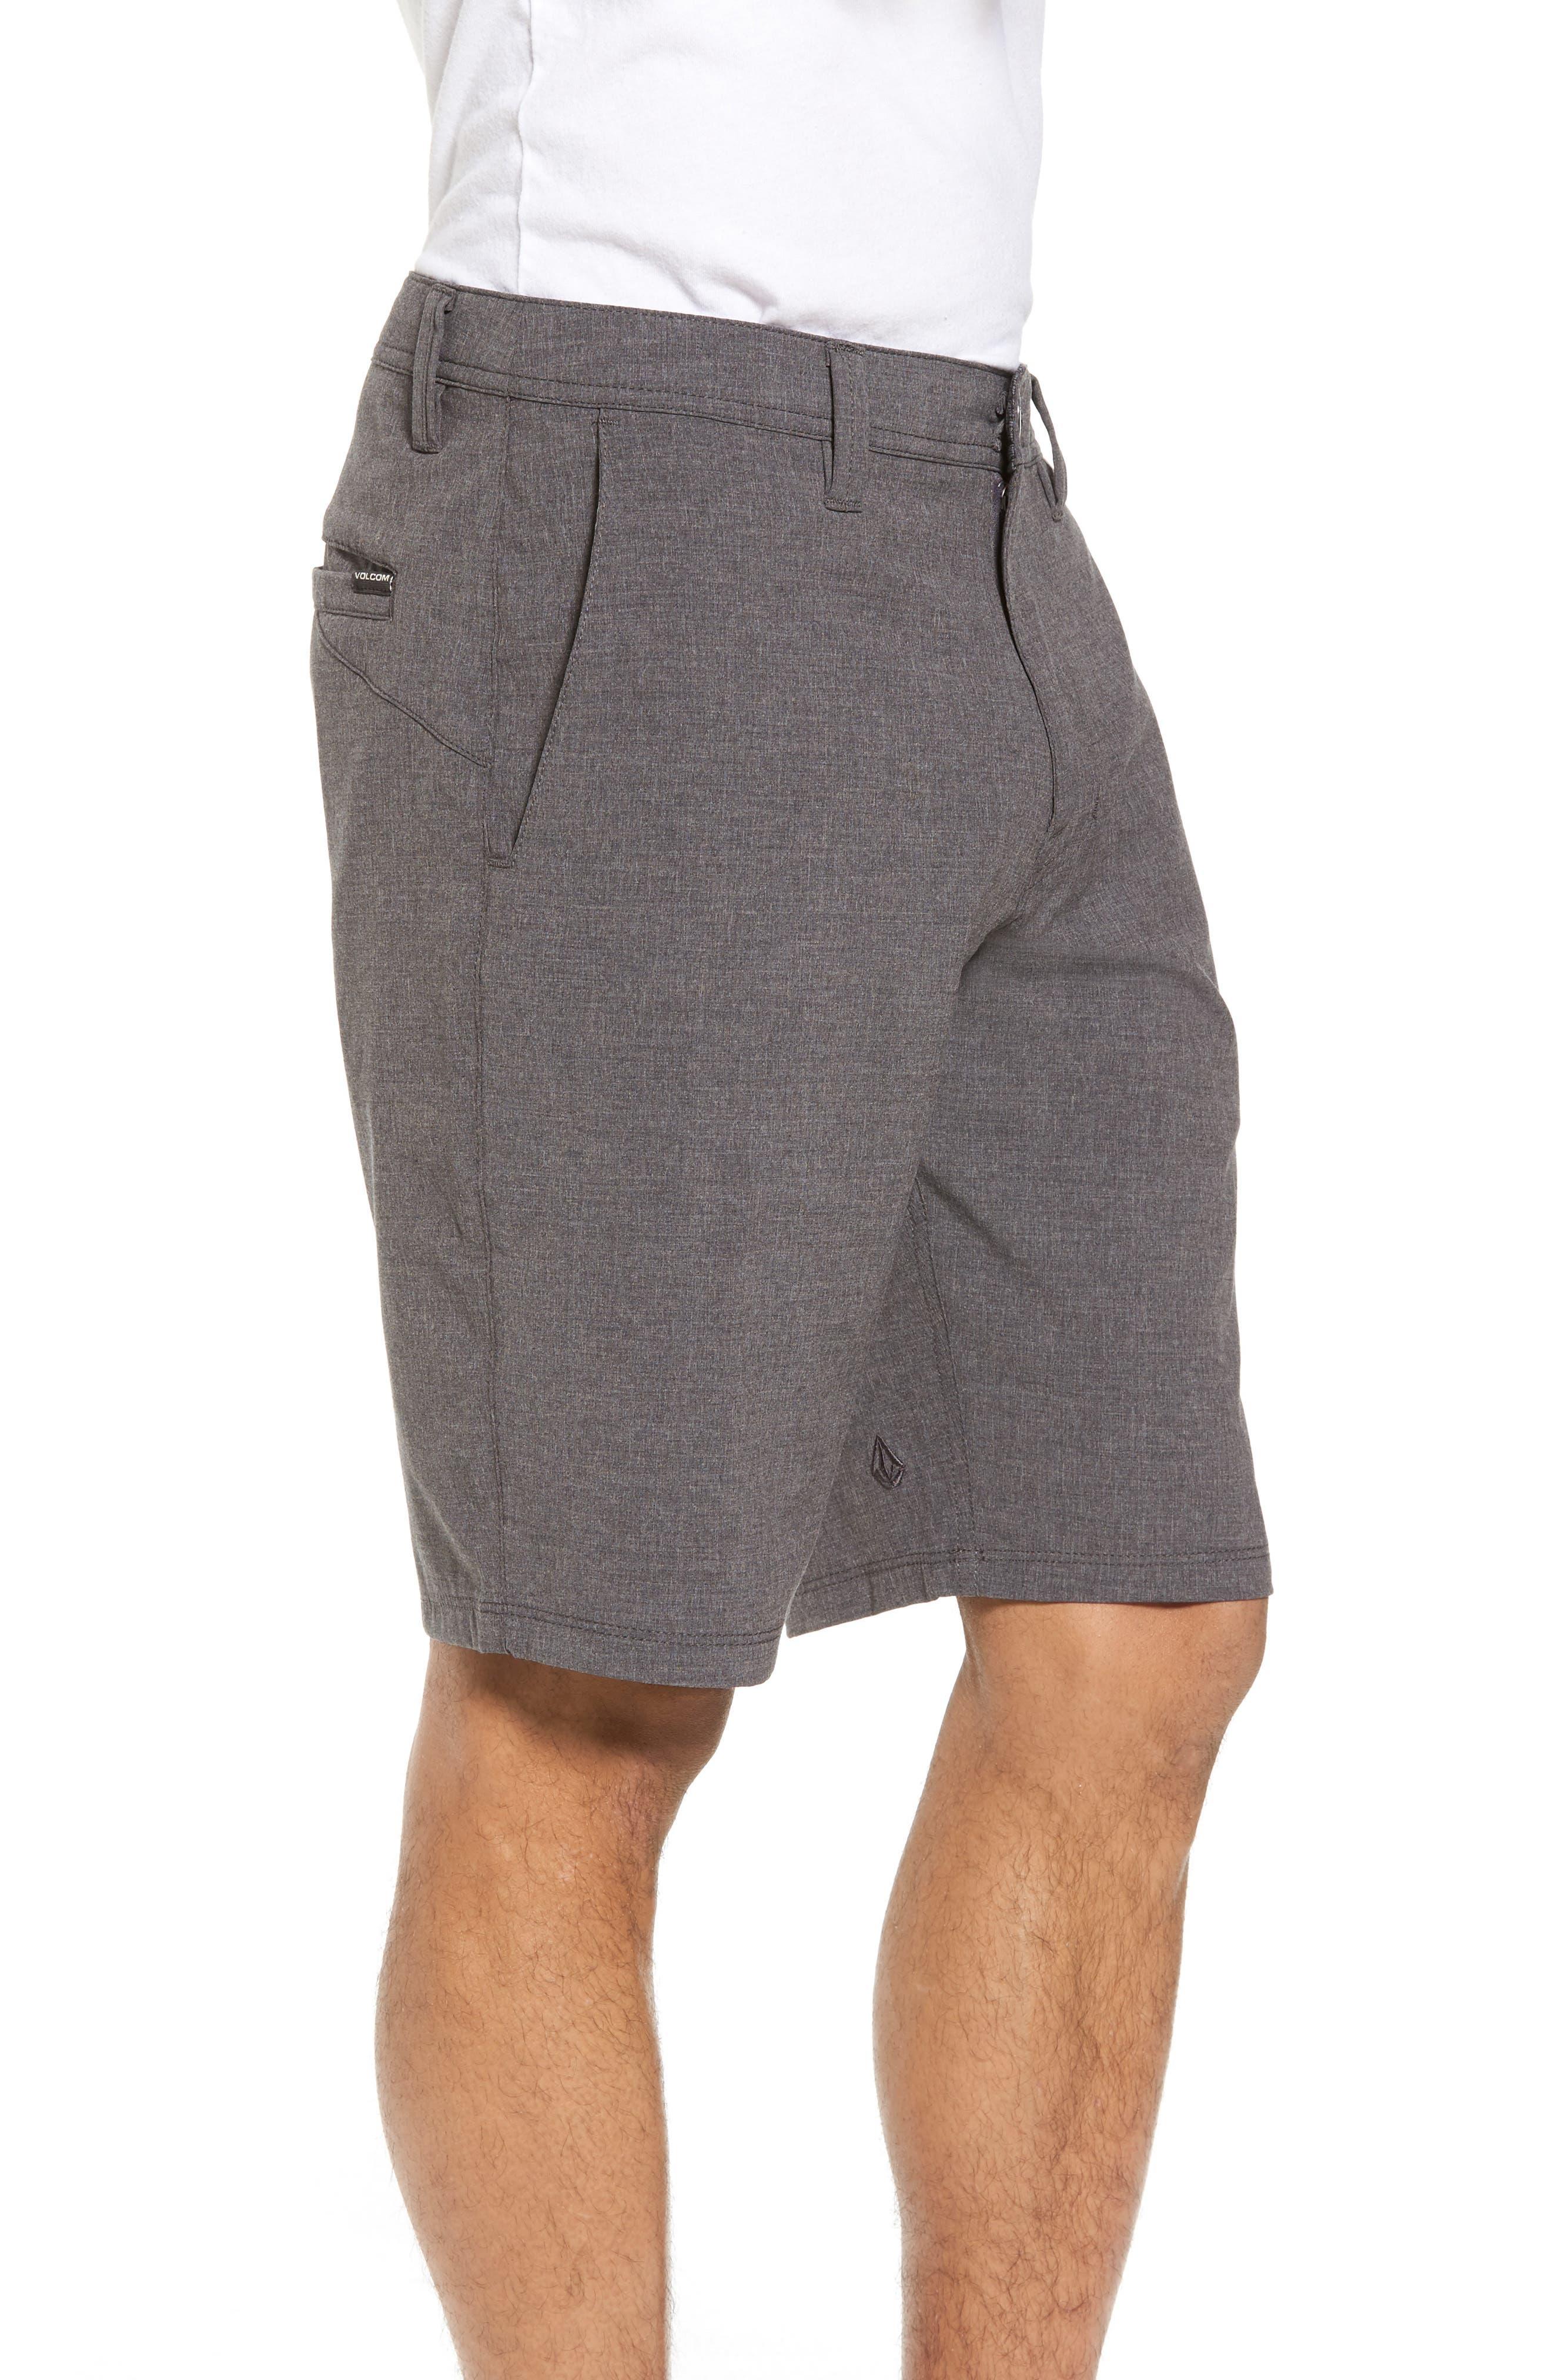 Hybrid Shorts,                             Alternate thumbnail 3, color,                             CHARCOAL